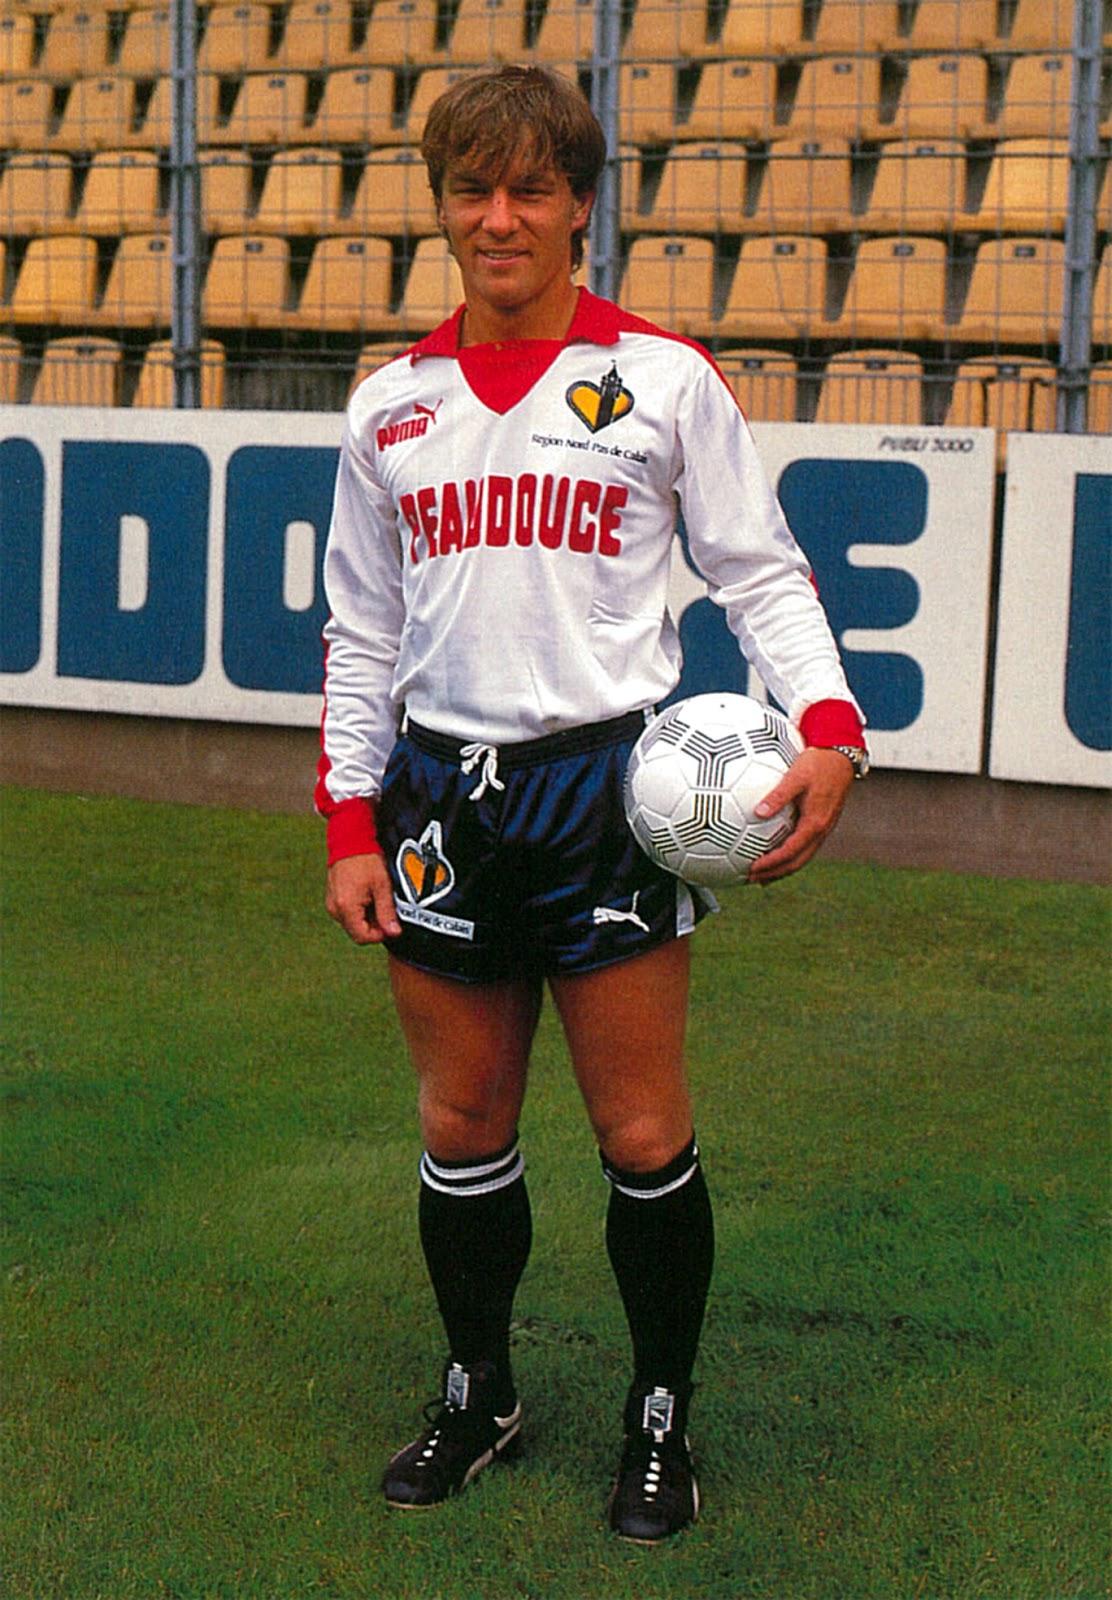 philippe piette losc lille peaudouce 1985-86